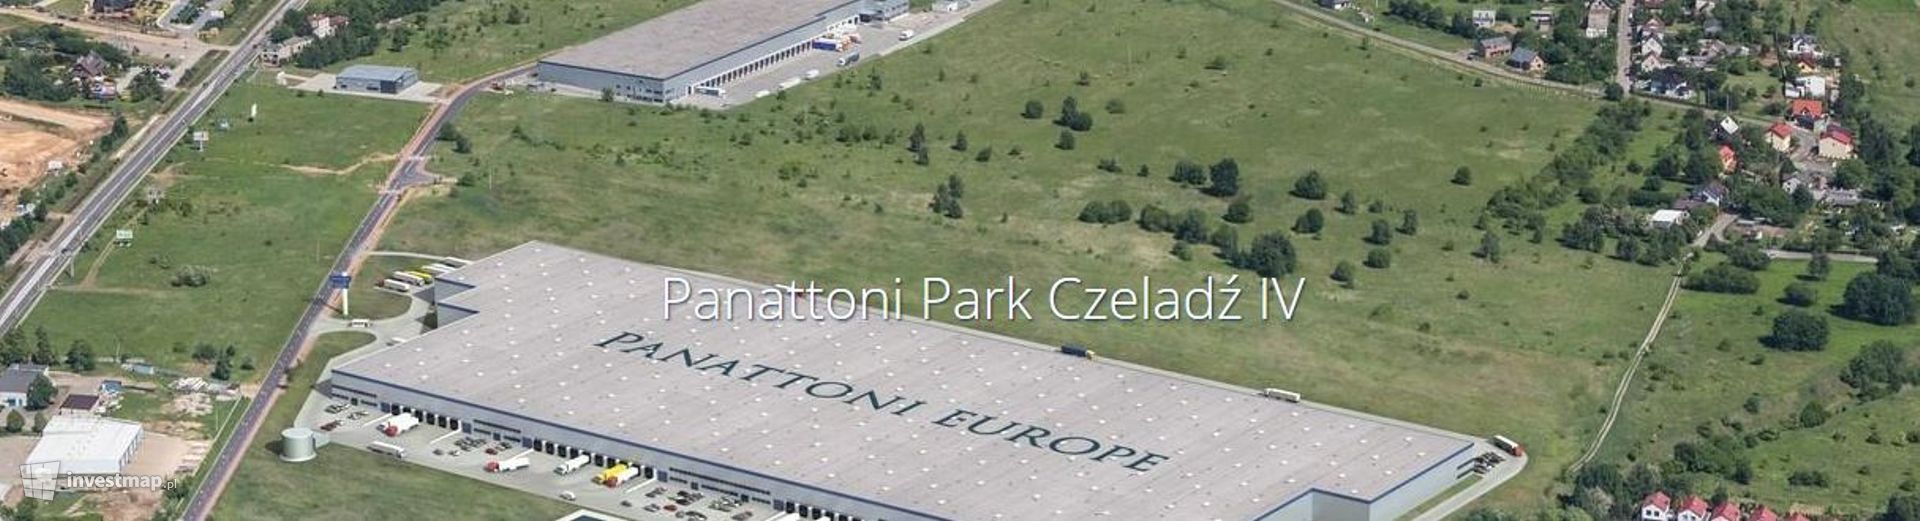 Panattoni Park Czeladź IV